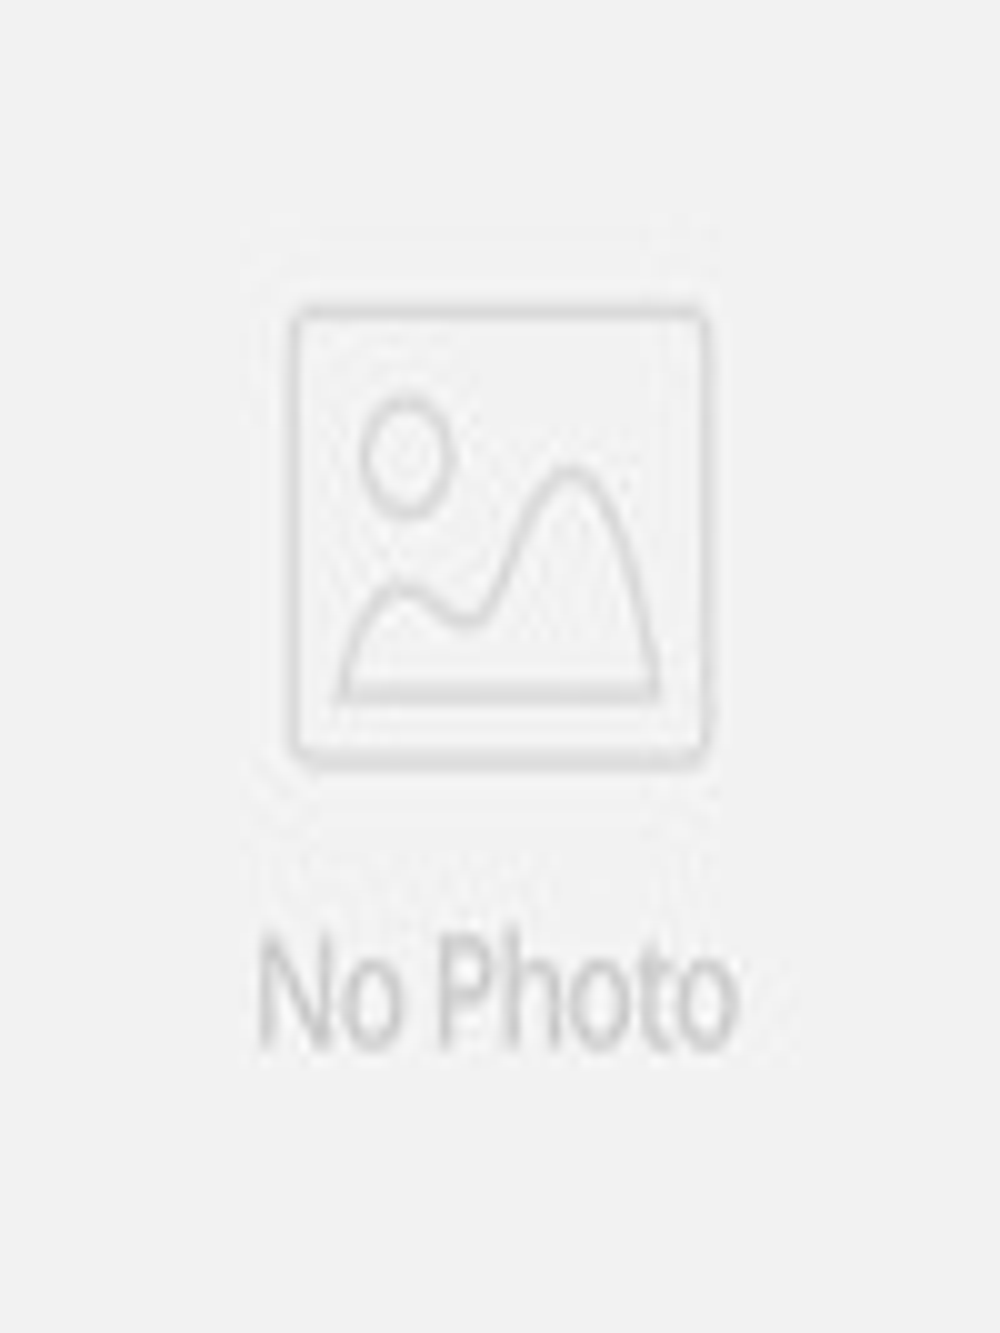 26PCS/SET Multicolour Aluminum Circular Knitting Needles Weave Stitches Knitting Craft Case can from 43cm/65cm/80cm/100cm/120cm(China (Mainland))